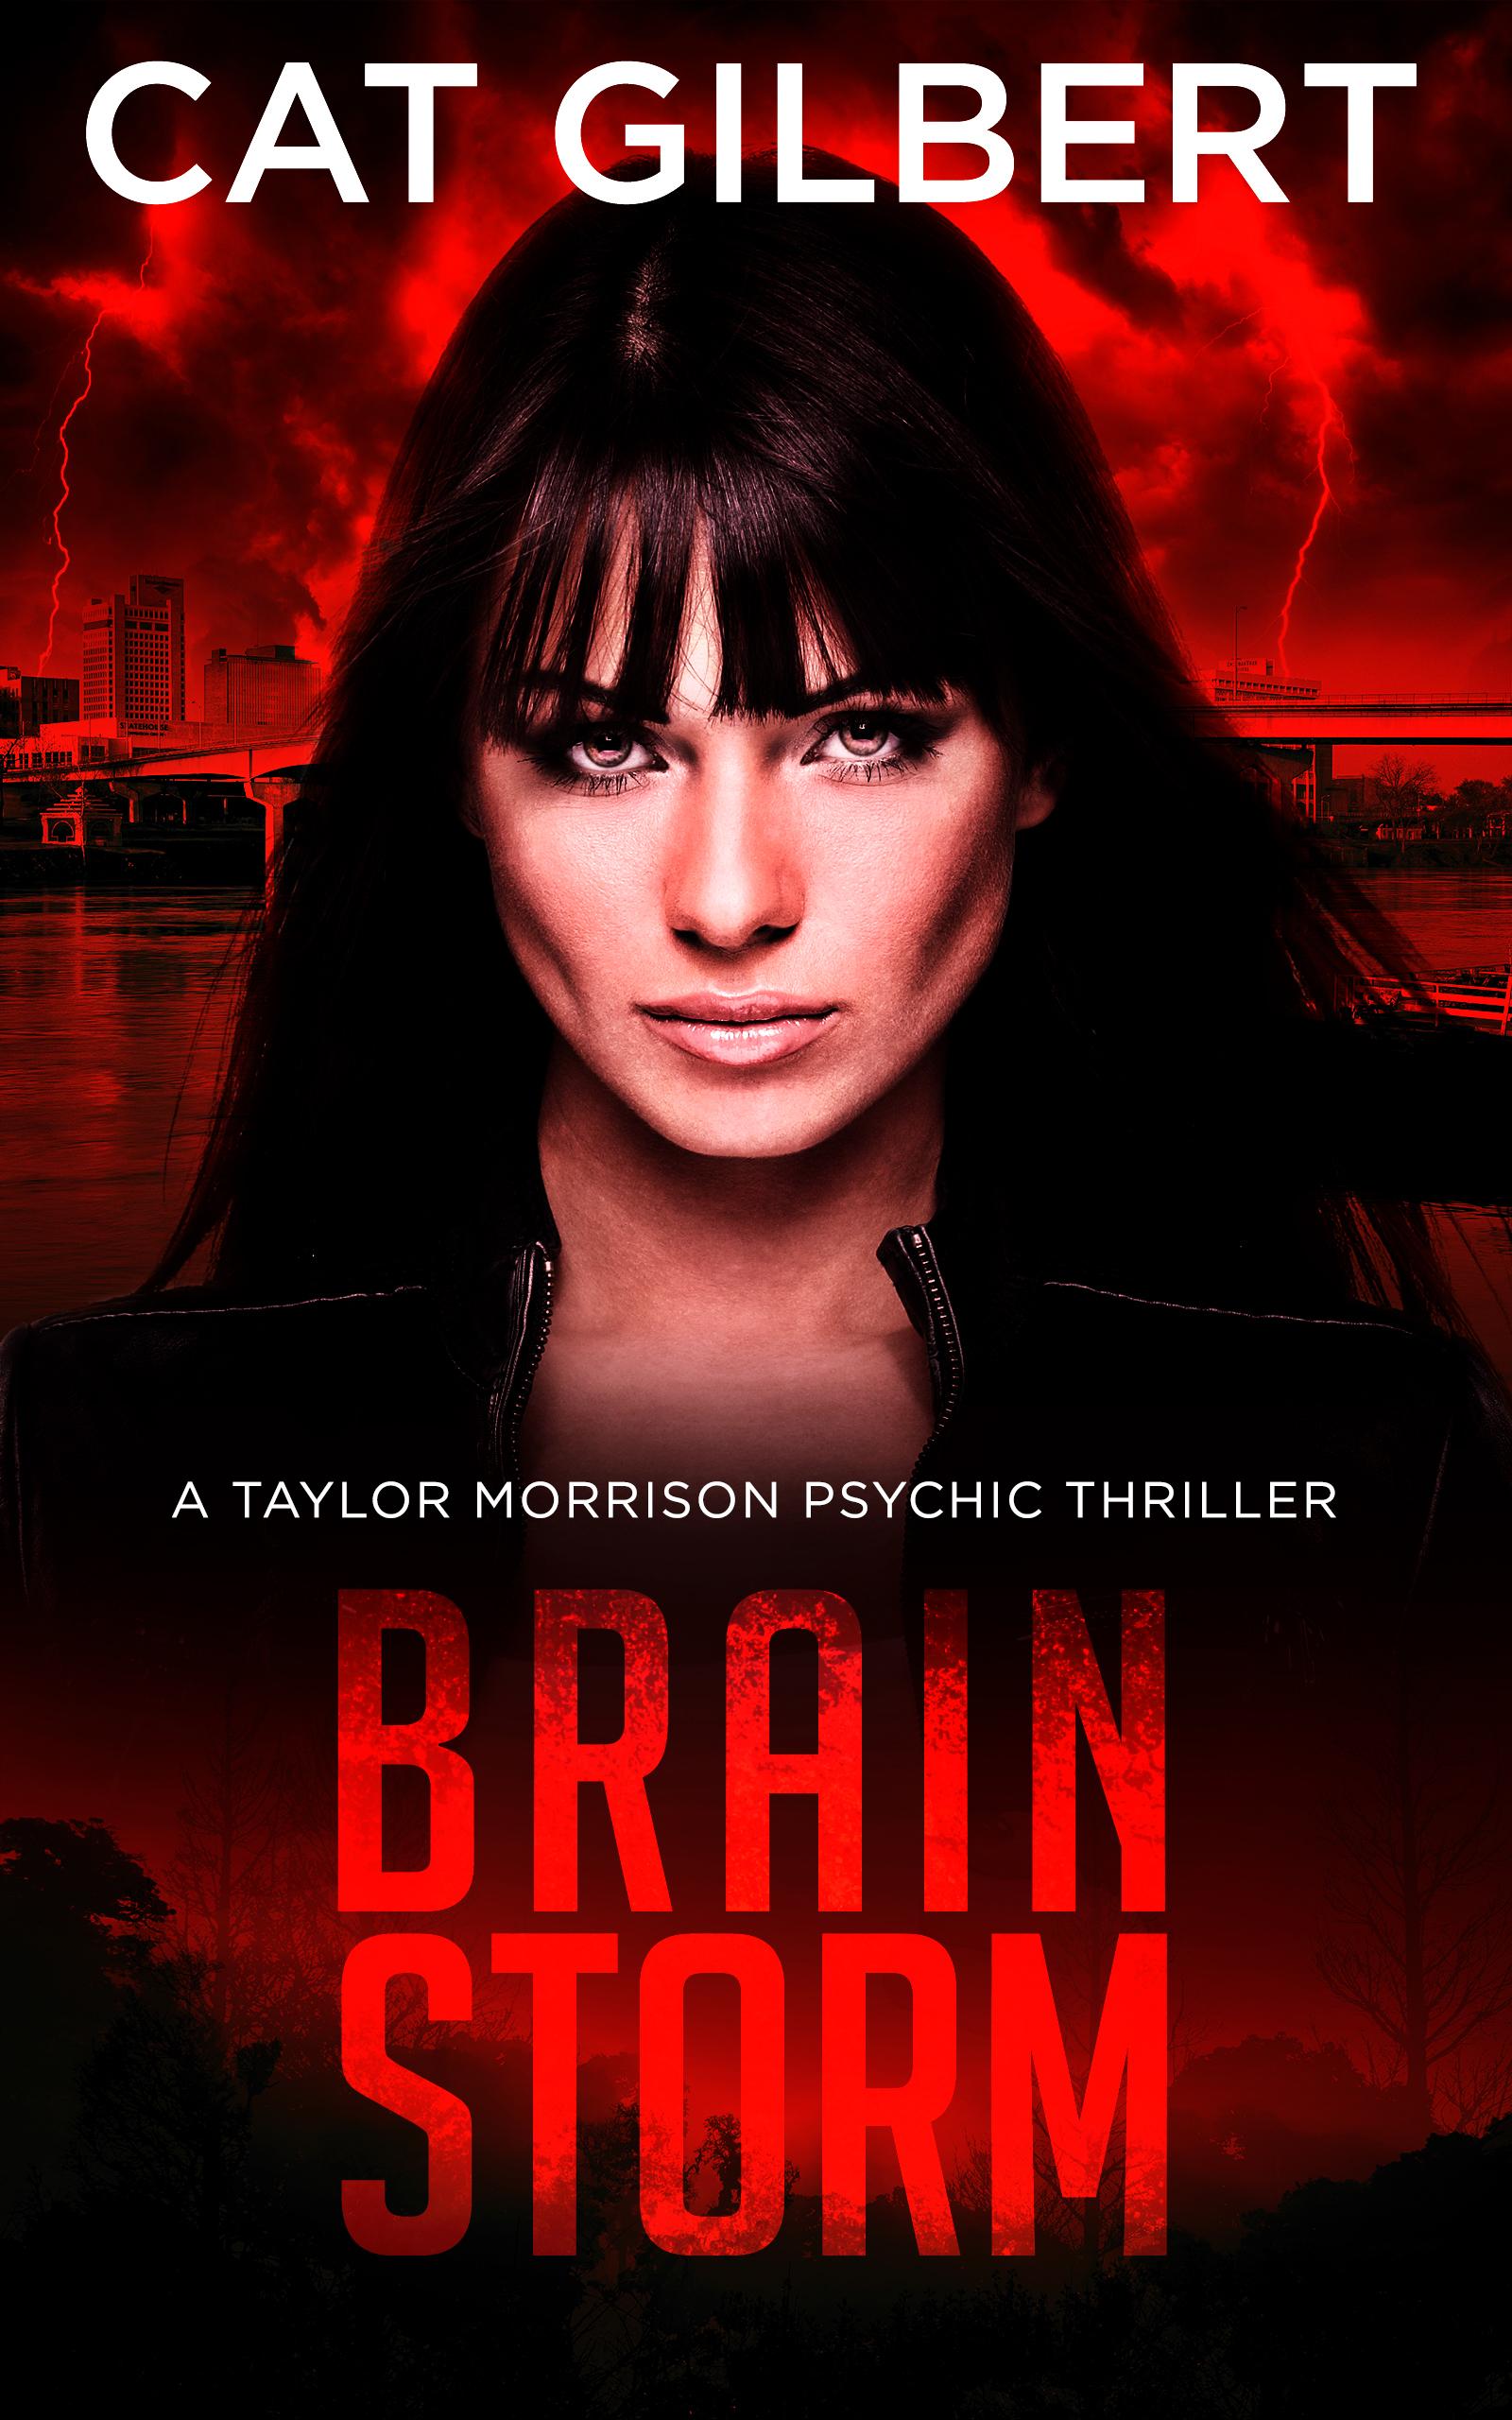 Brain Storm (Taylor Morrison Psychic Thriller, #1)